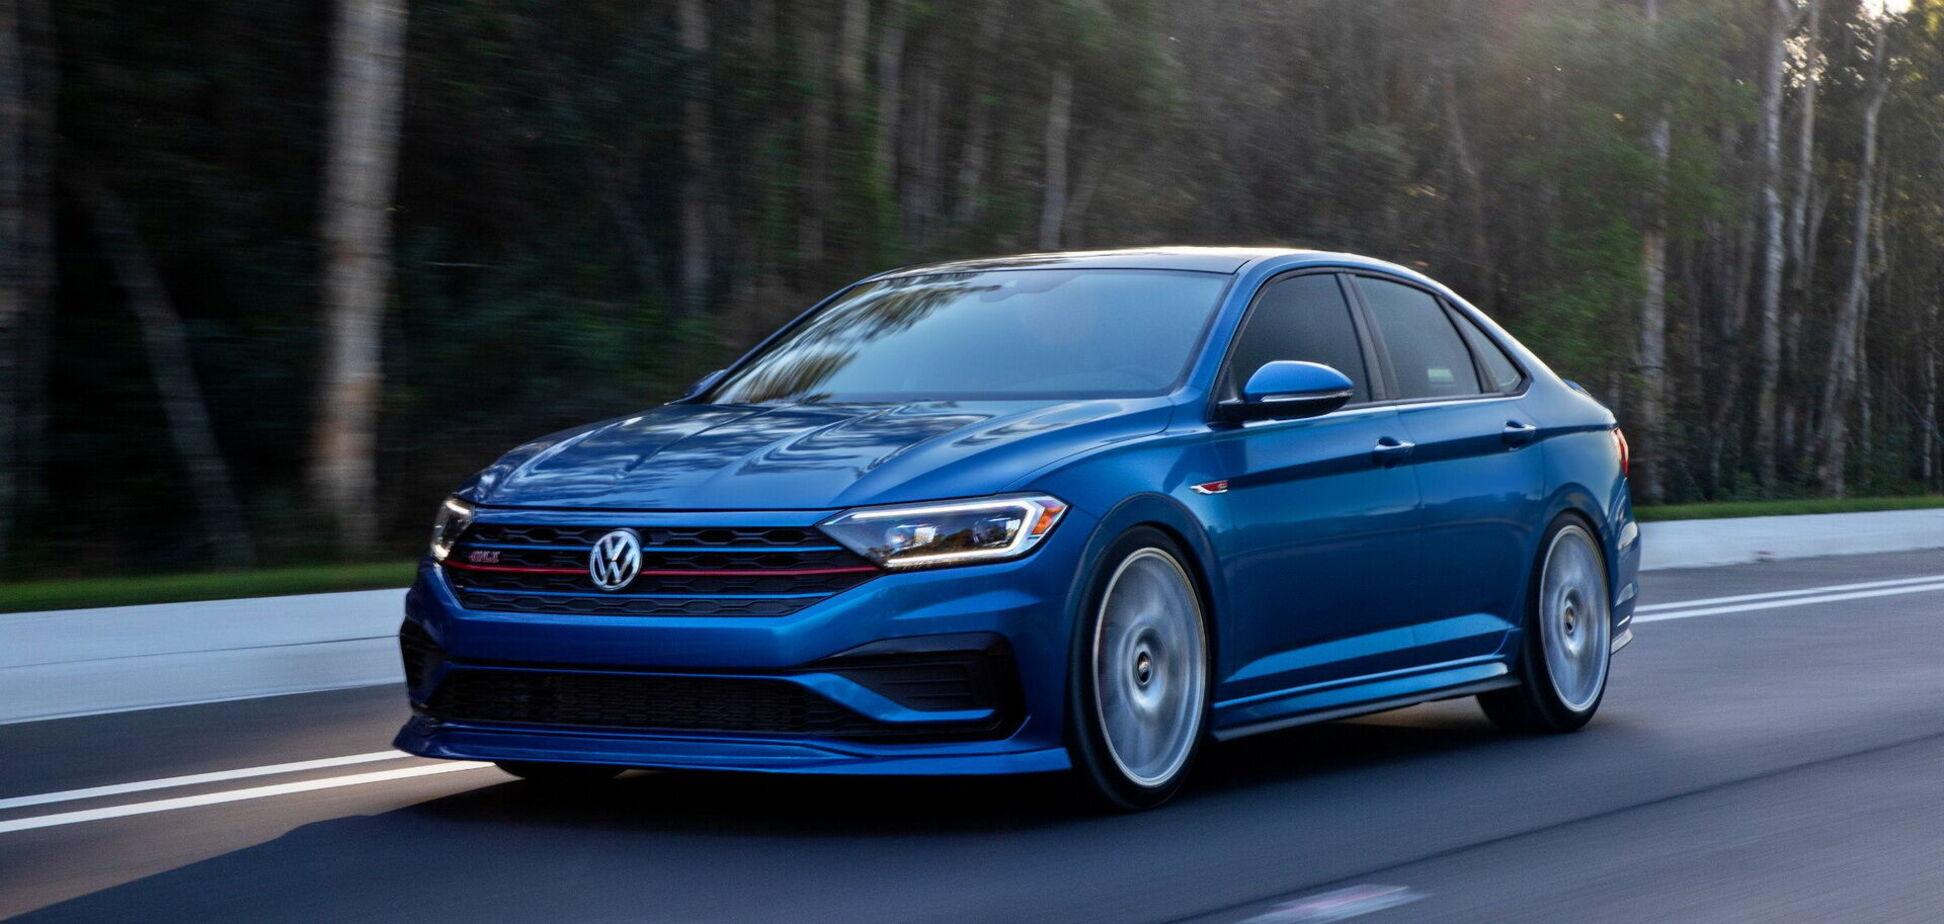 VW показал версию 'Голубая лагуна' седана Jetta GLI